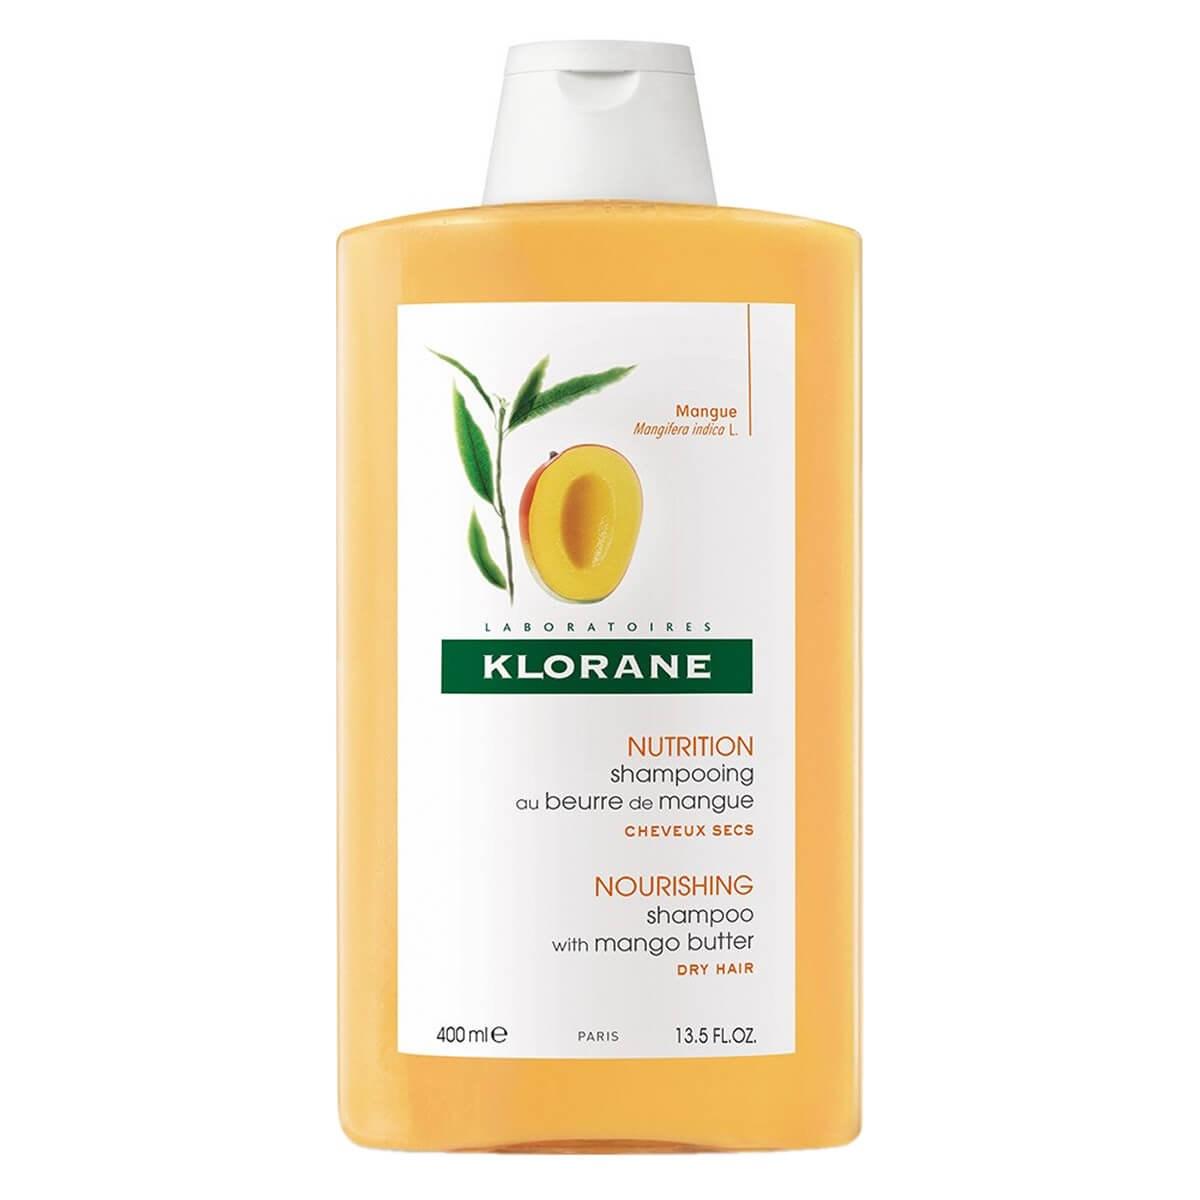 Klorane  Nourishing Shampoo With Mango Butter